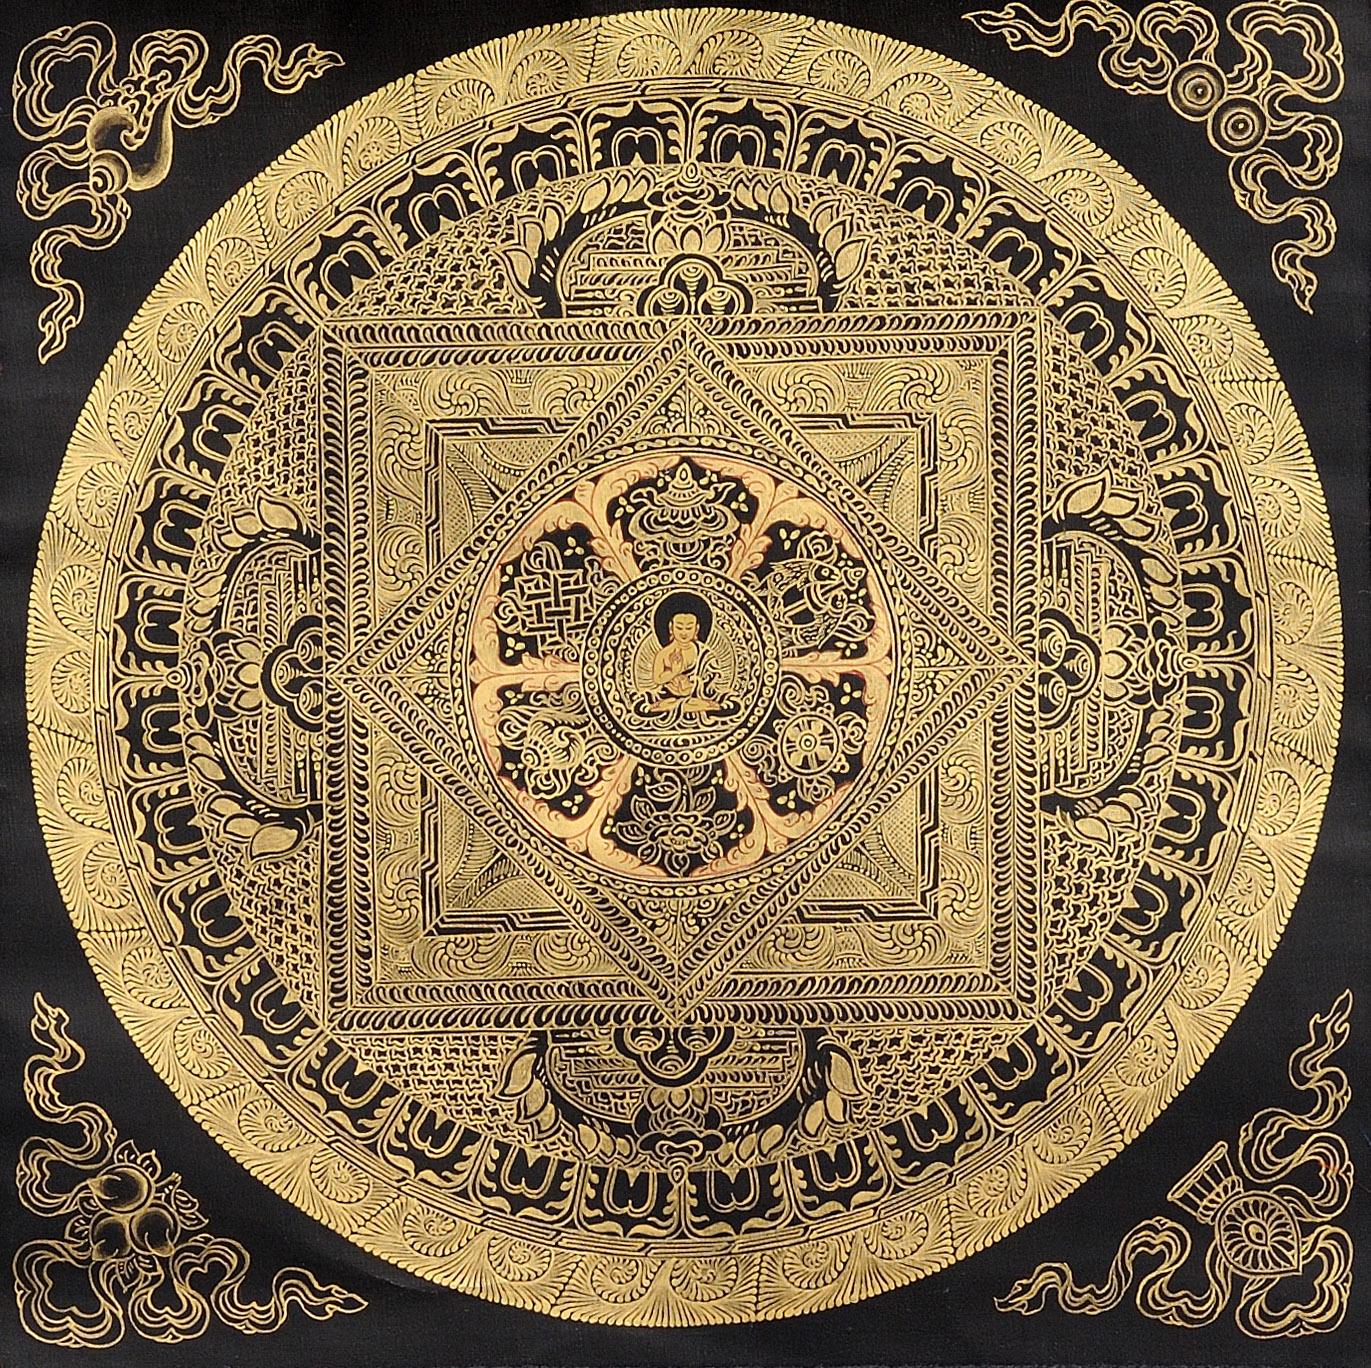 The Buddha Mandala with Eight Auspicious Symbols